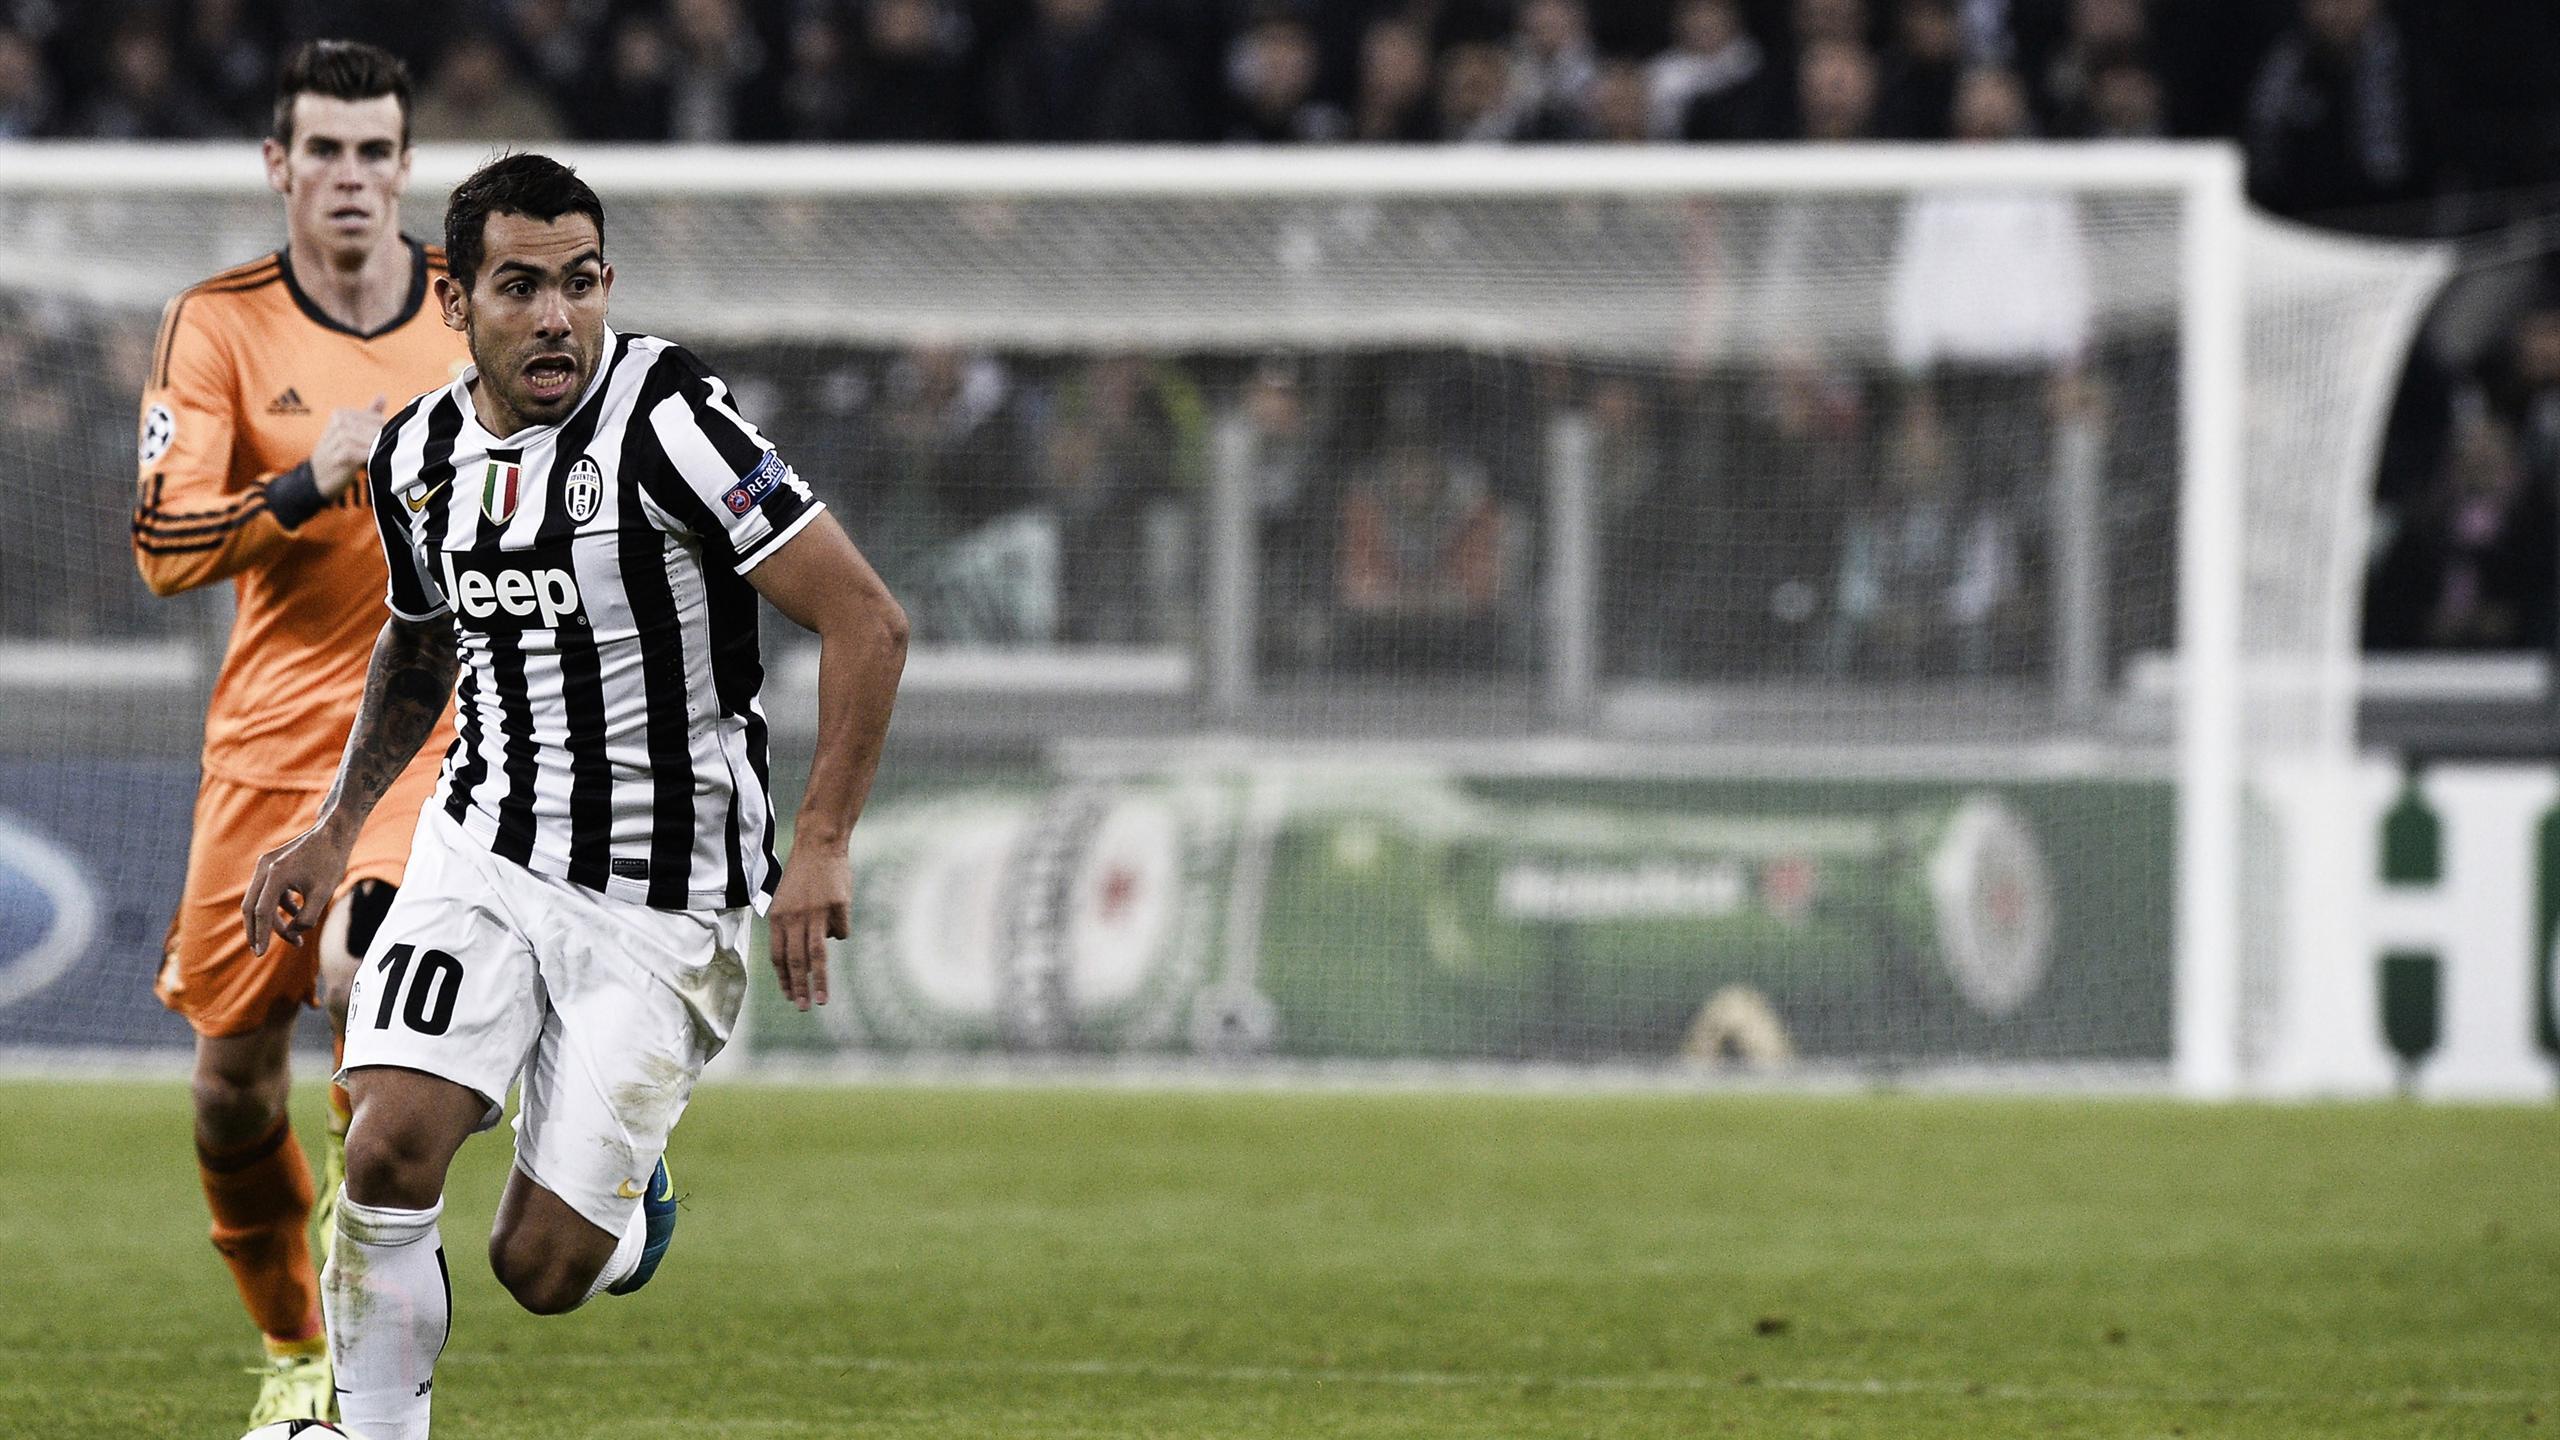 2015, Carlos Tevez, Gareth Bale, Juventus-Real Madrid, LaPresse